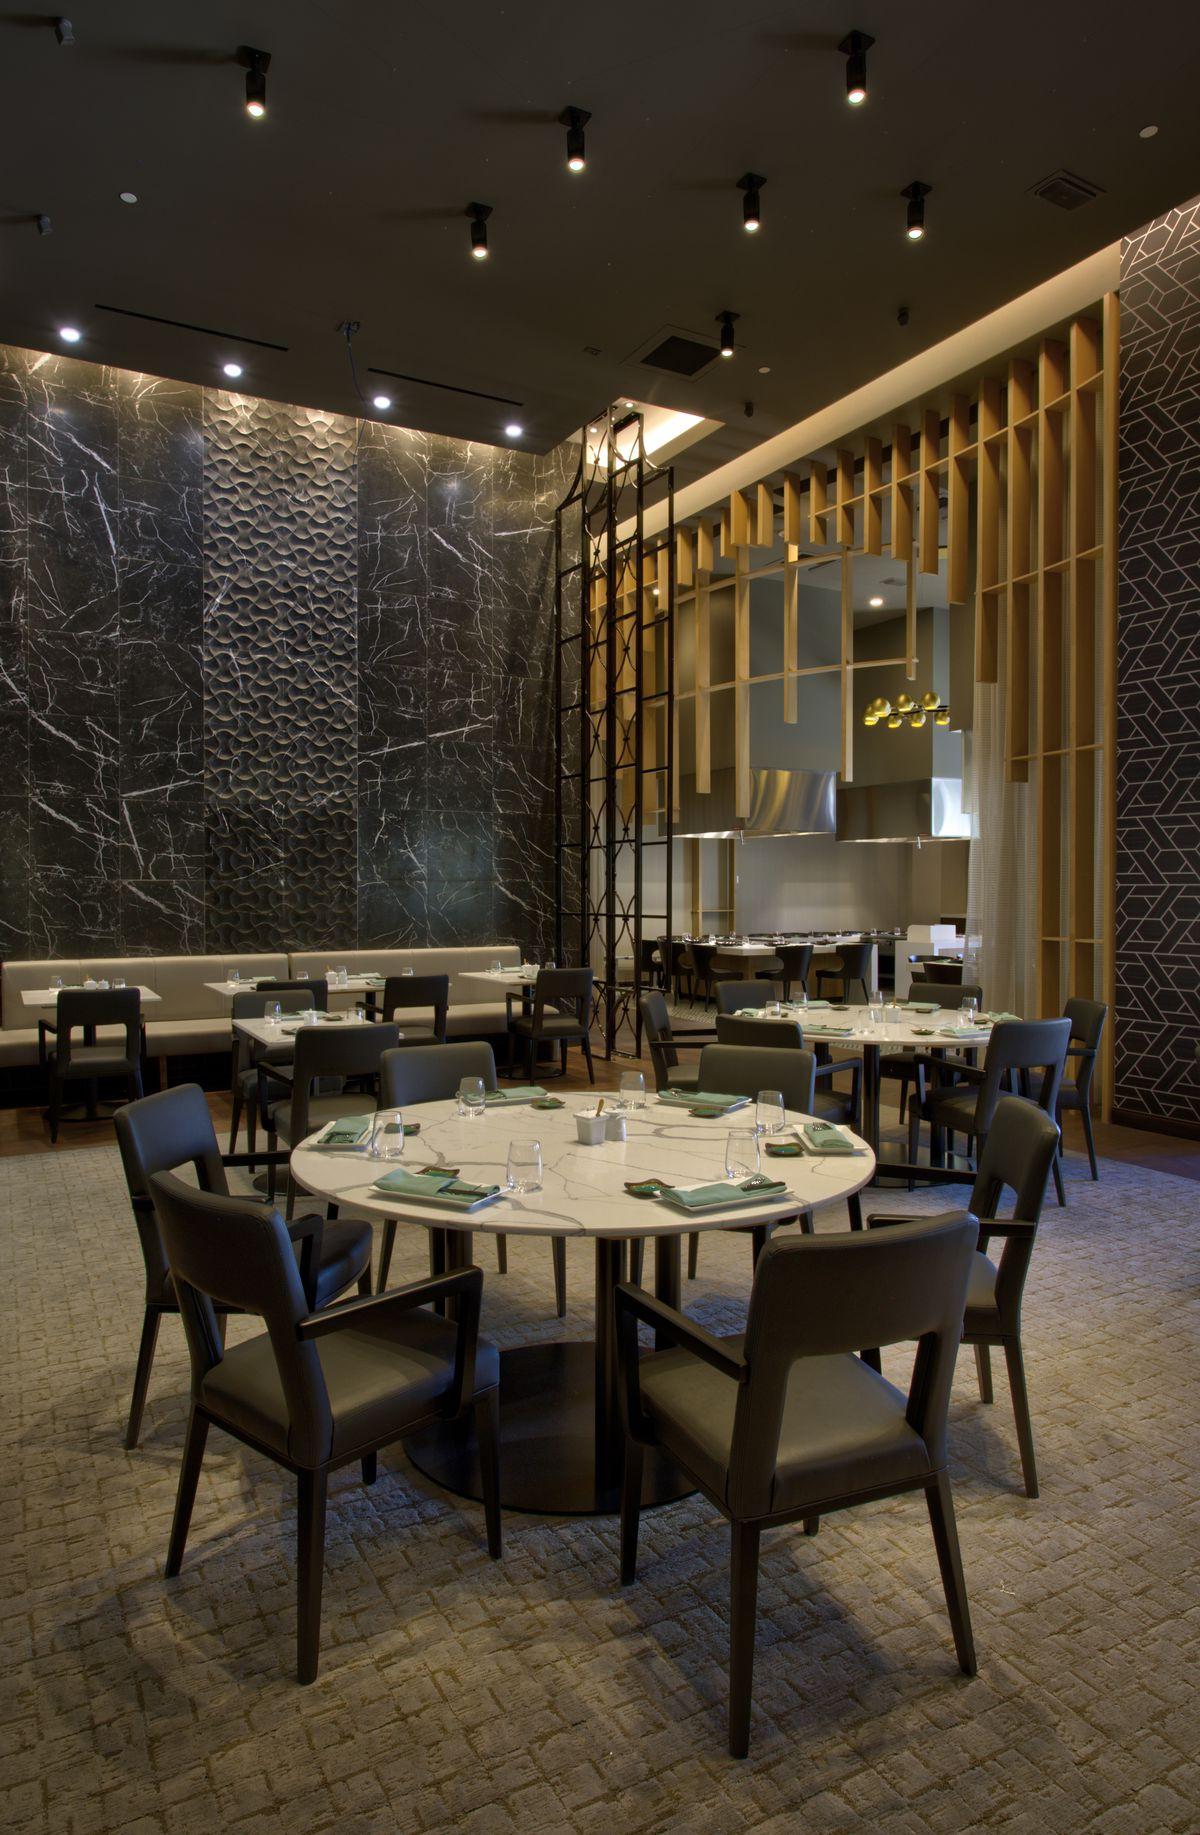 The dining room at Jade